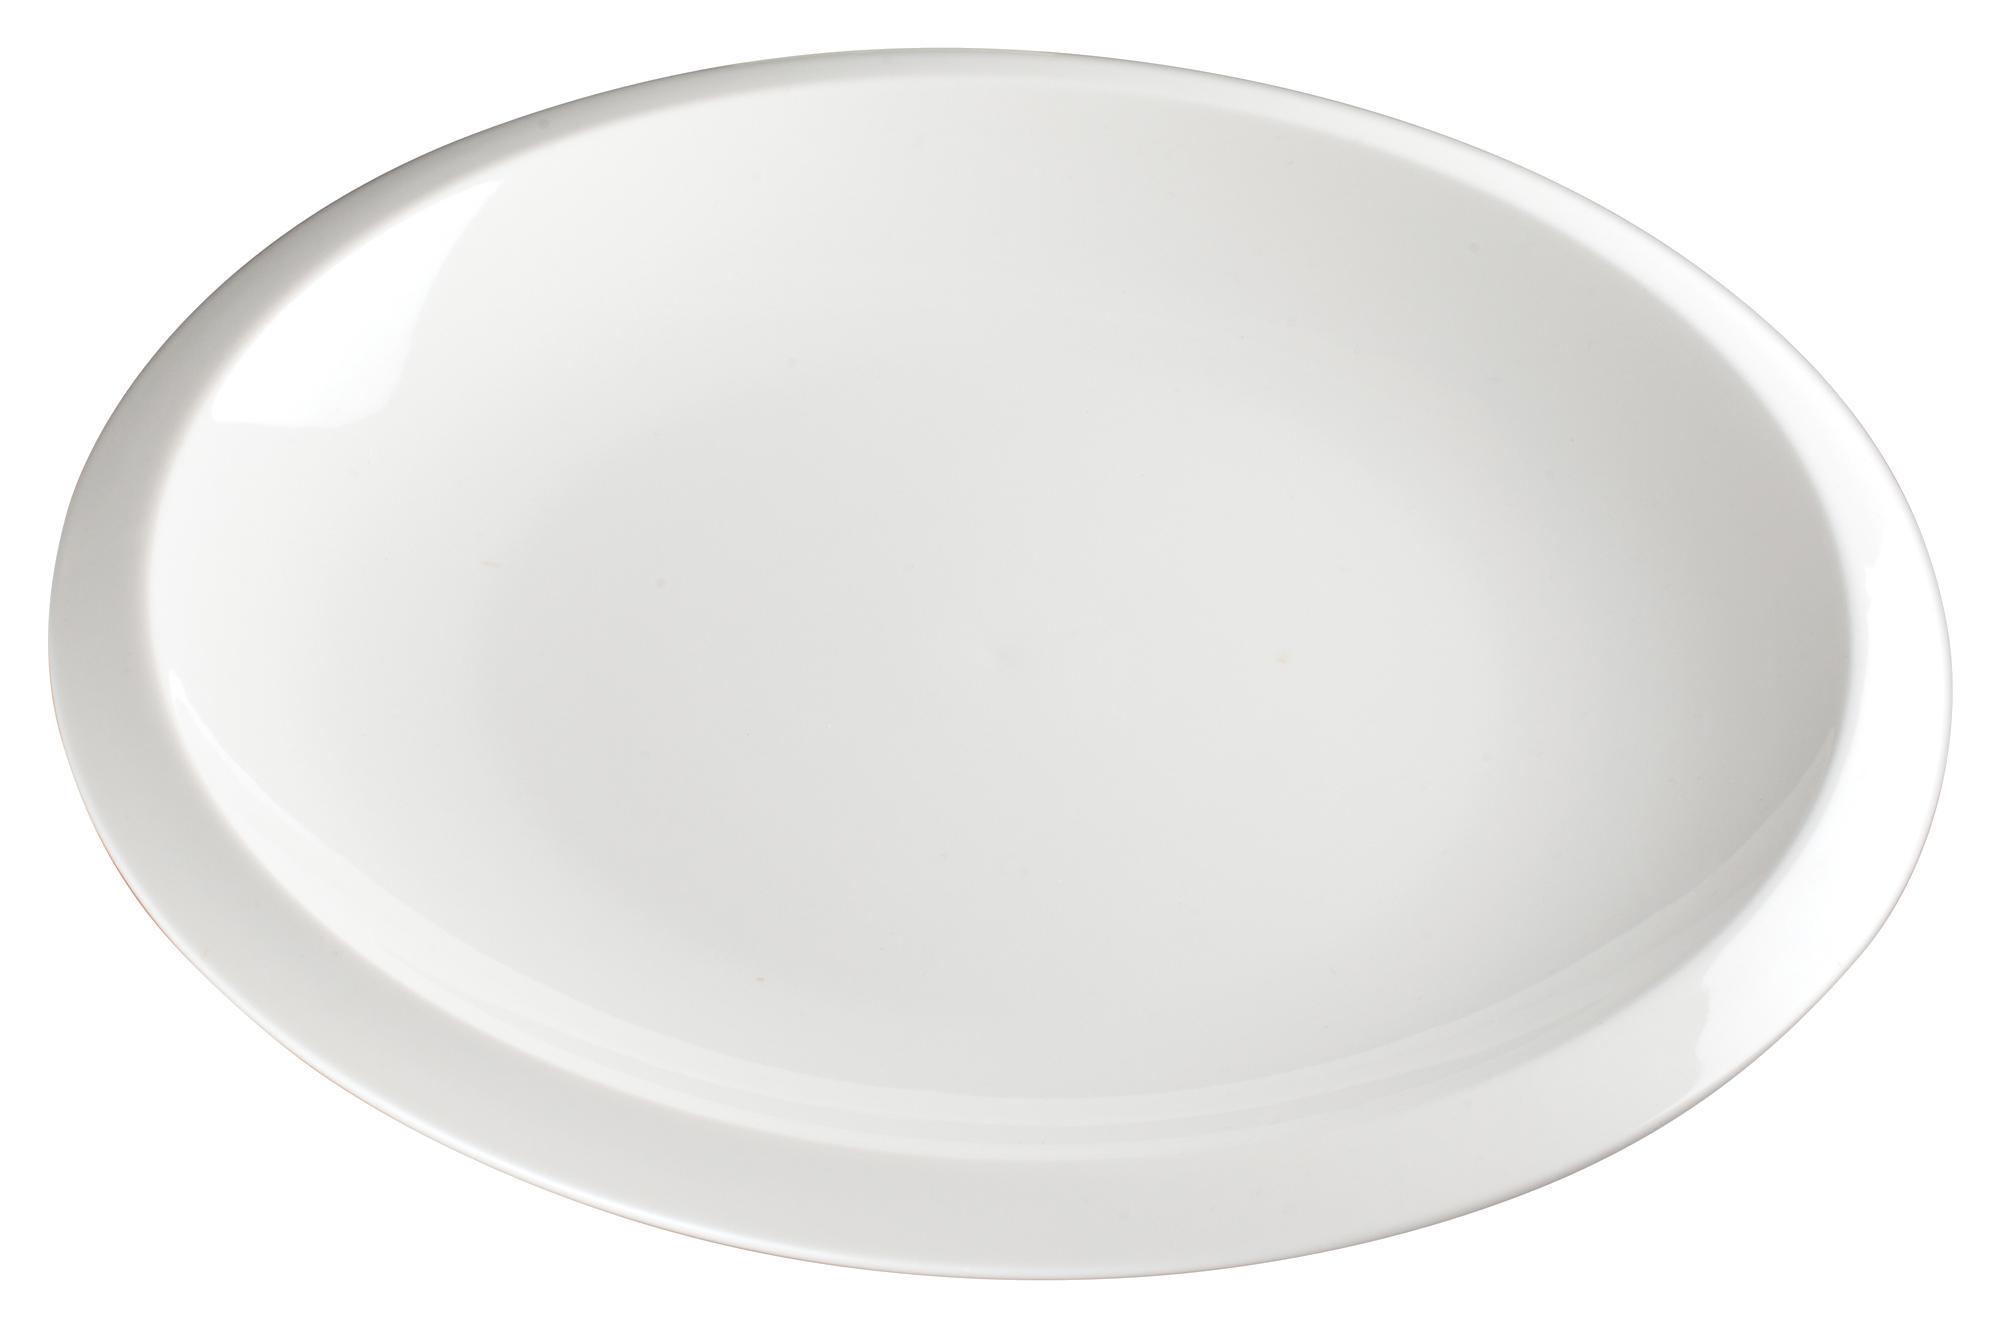 Winco WDP006-203 plate, china